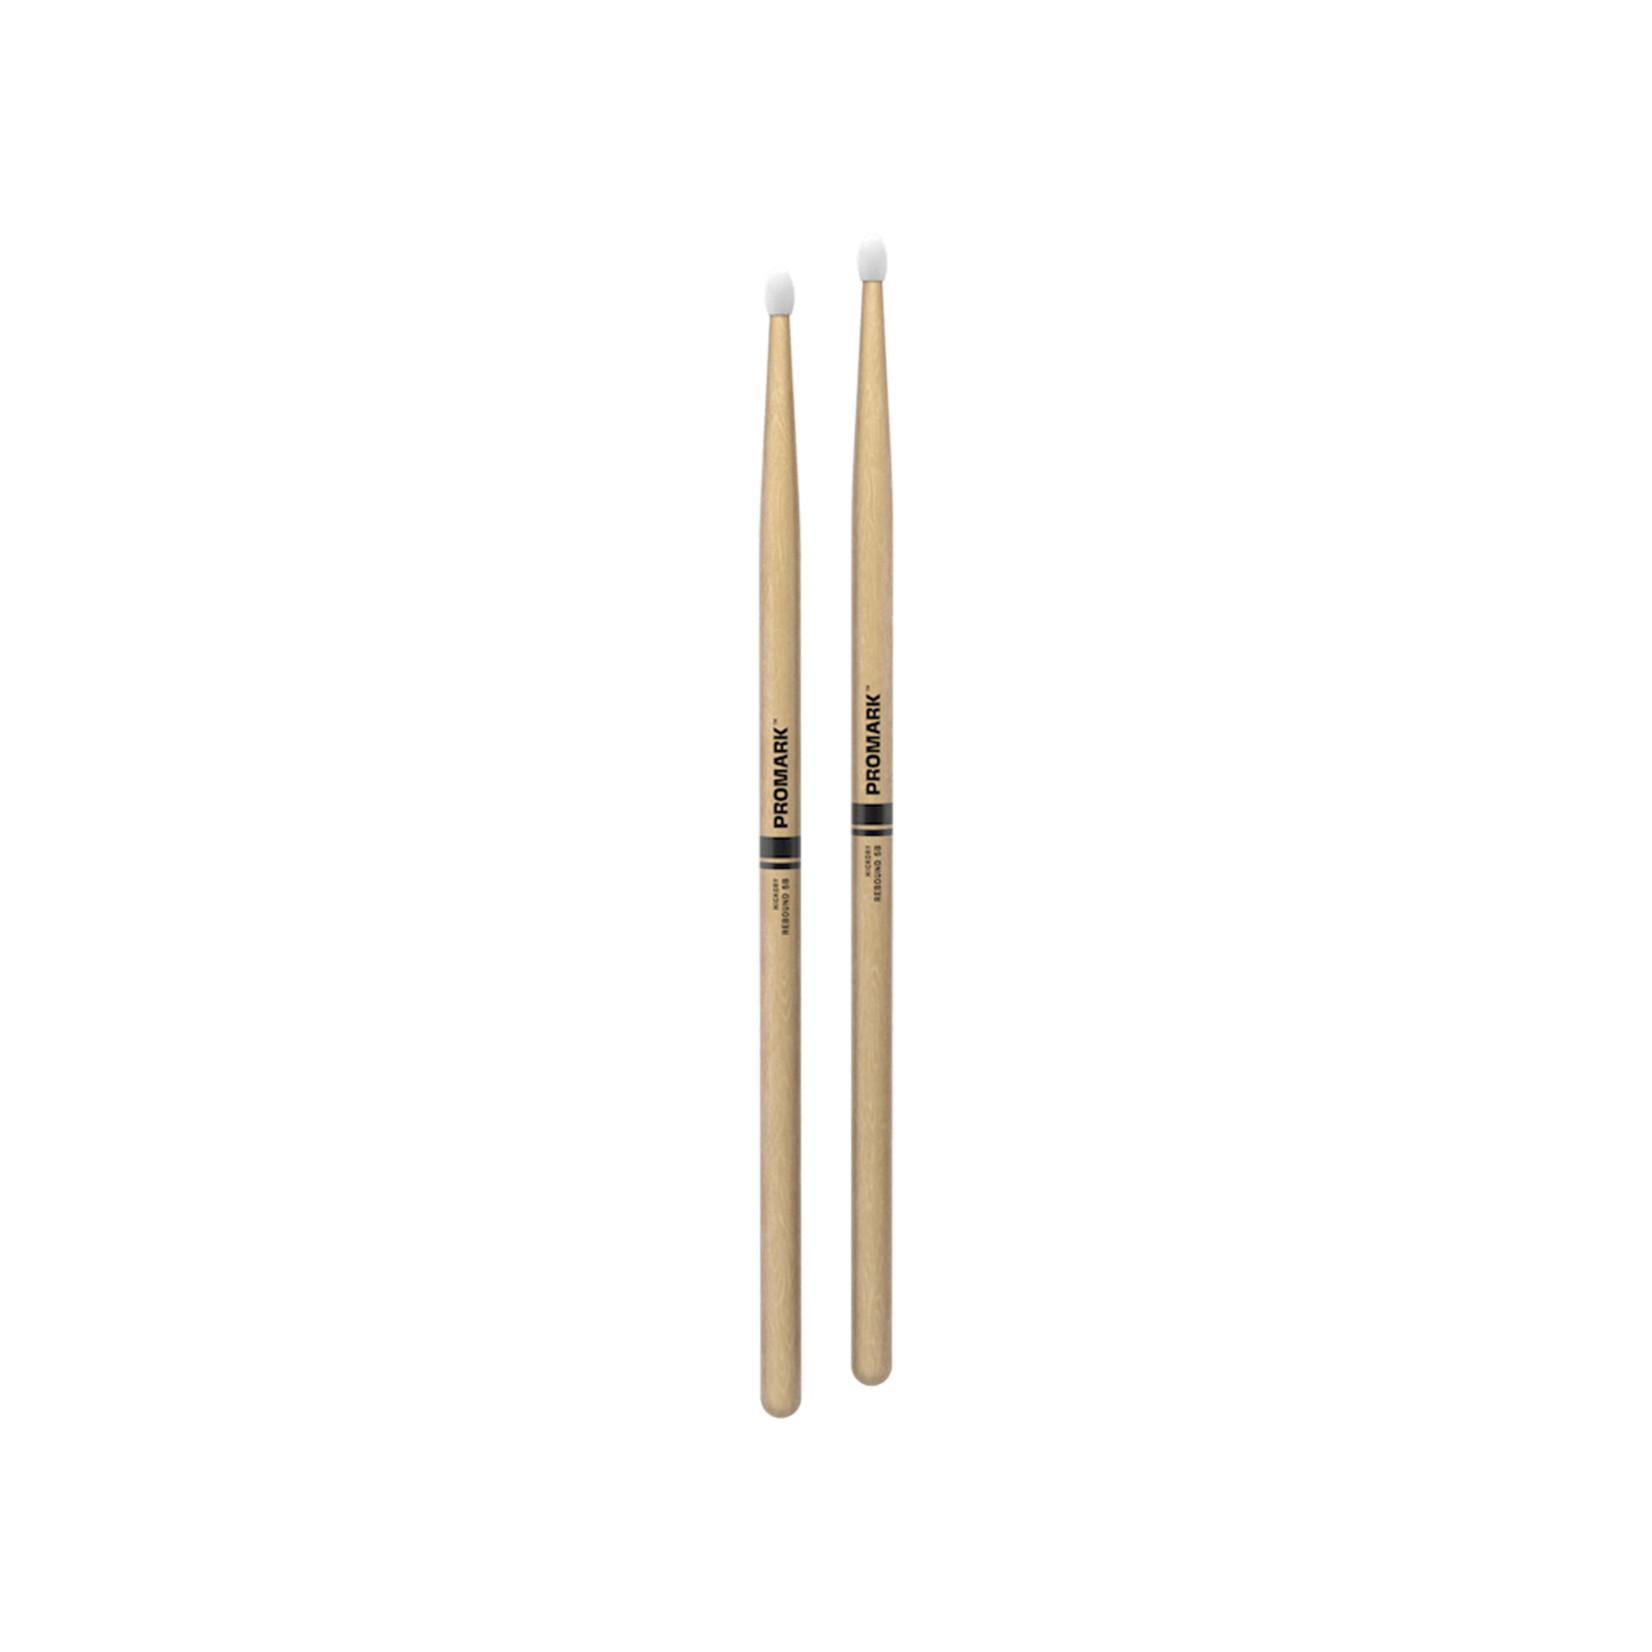 Promark ProMark Rebound 5B Hickory Nylon Tip Drumstick